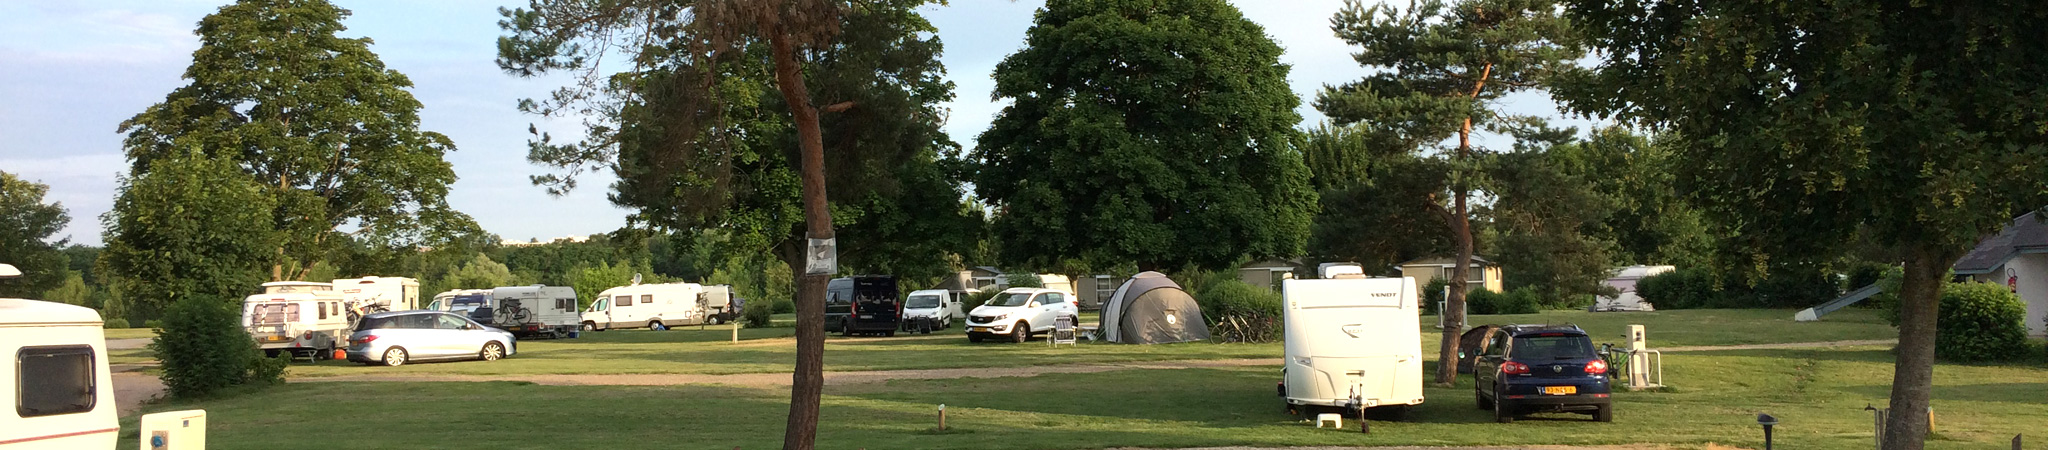 En savoir plus Camping Loisir Blois